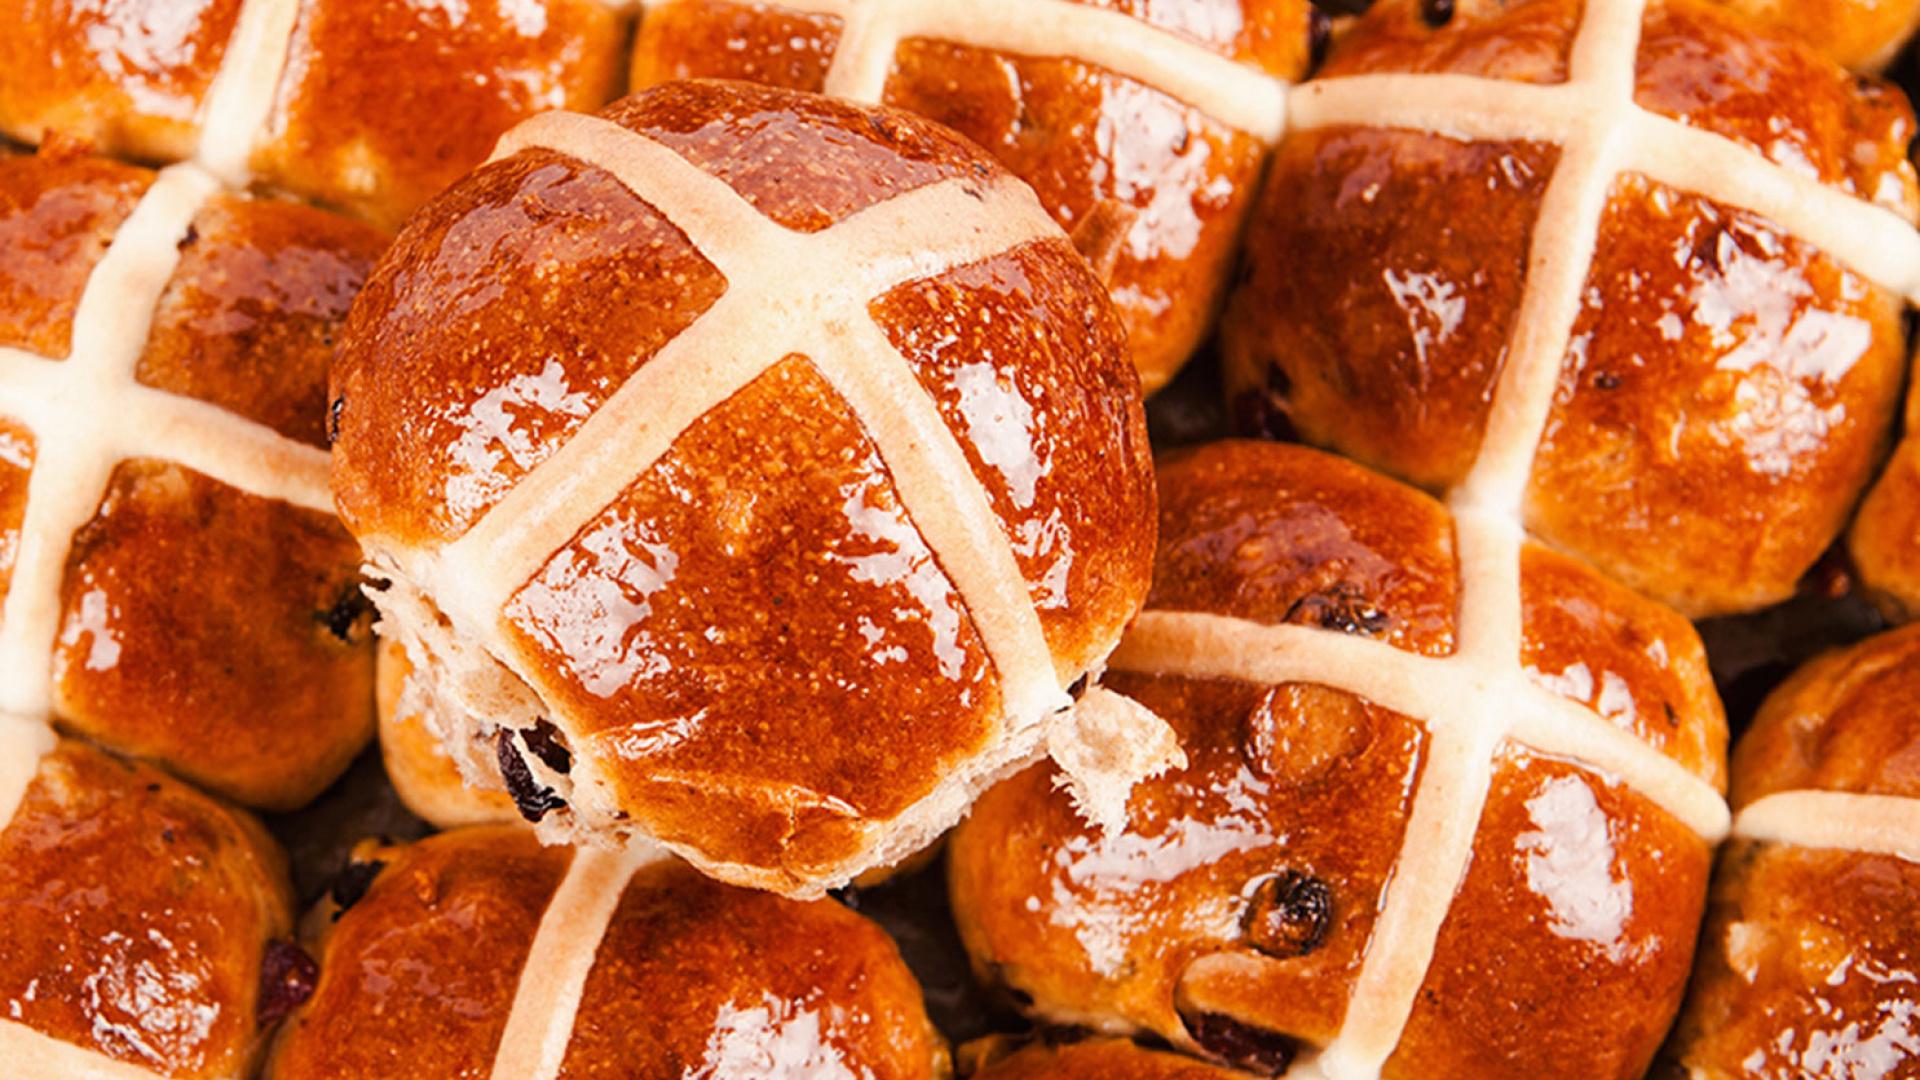 Gail's hot cross buns